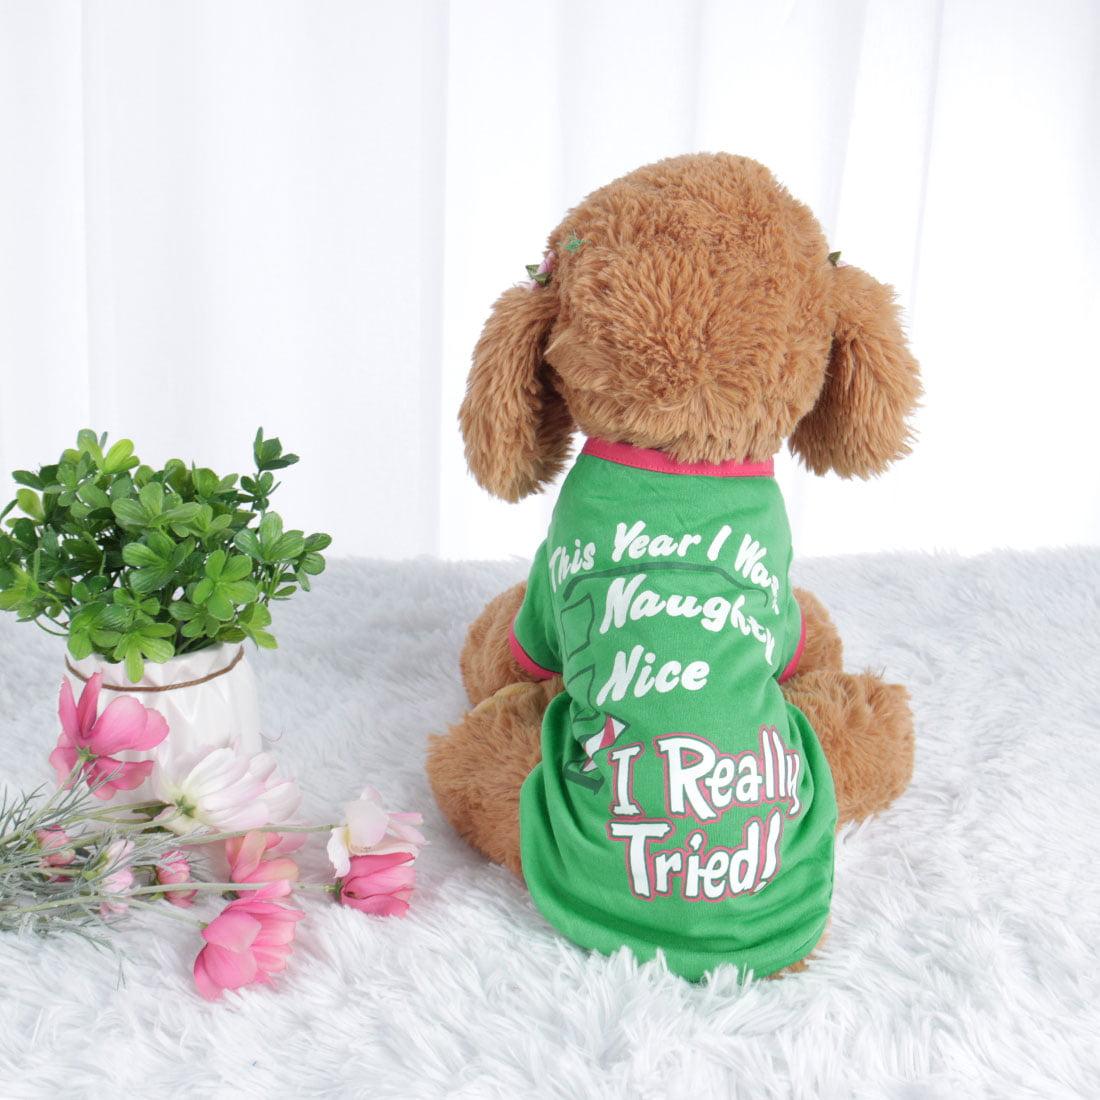 Dog T Shirt Puppy Small Pet Sweatshirt Tops Clothes Apparel Vest Costume #2, L - image 5 of 7